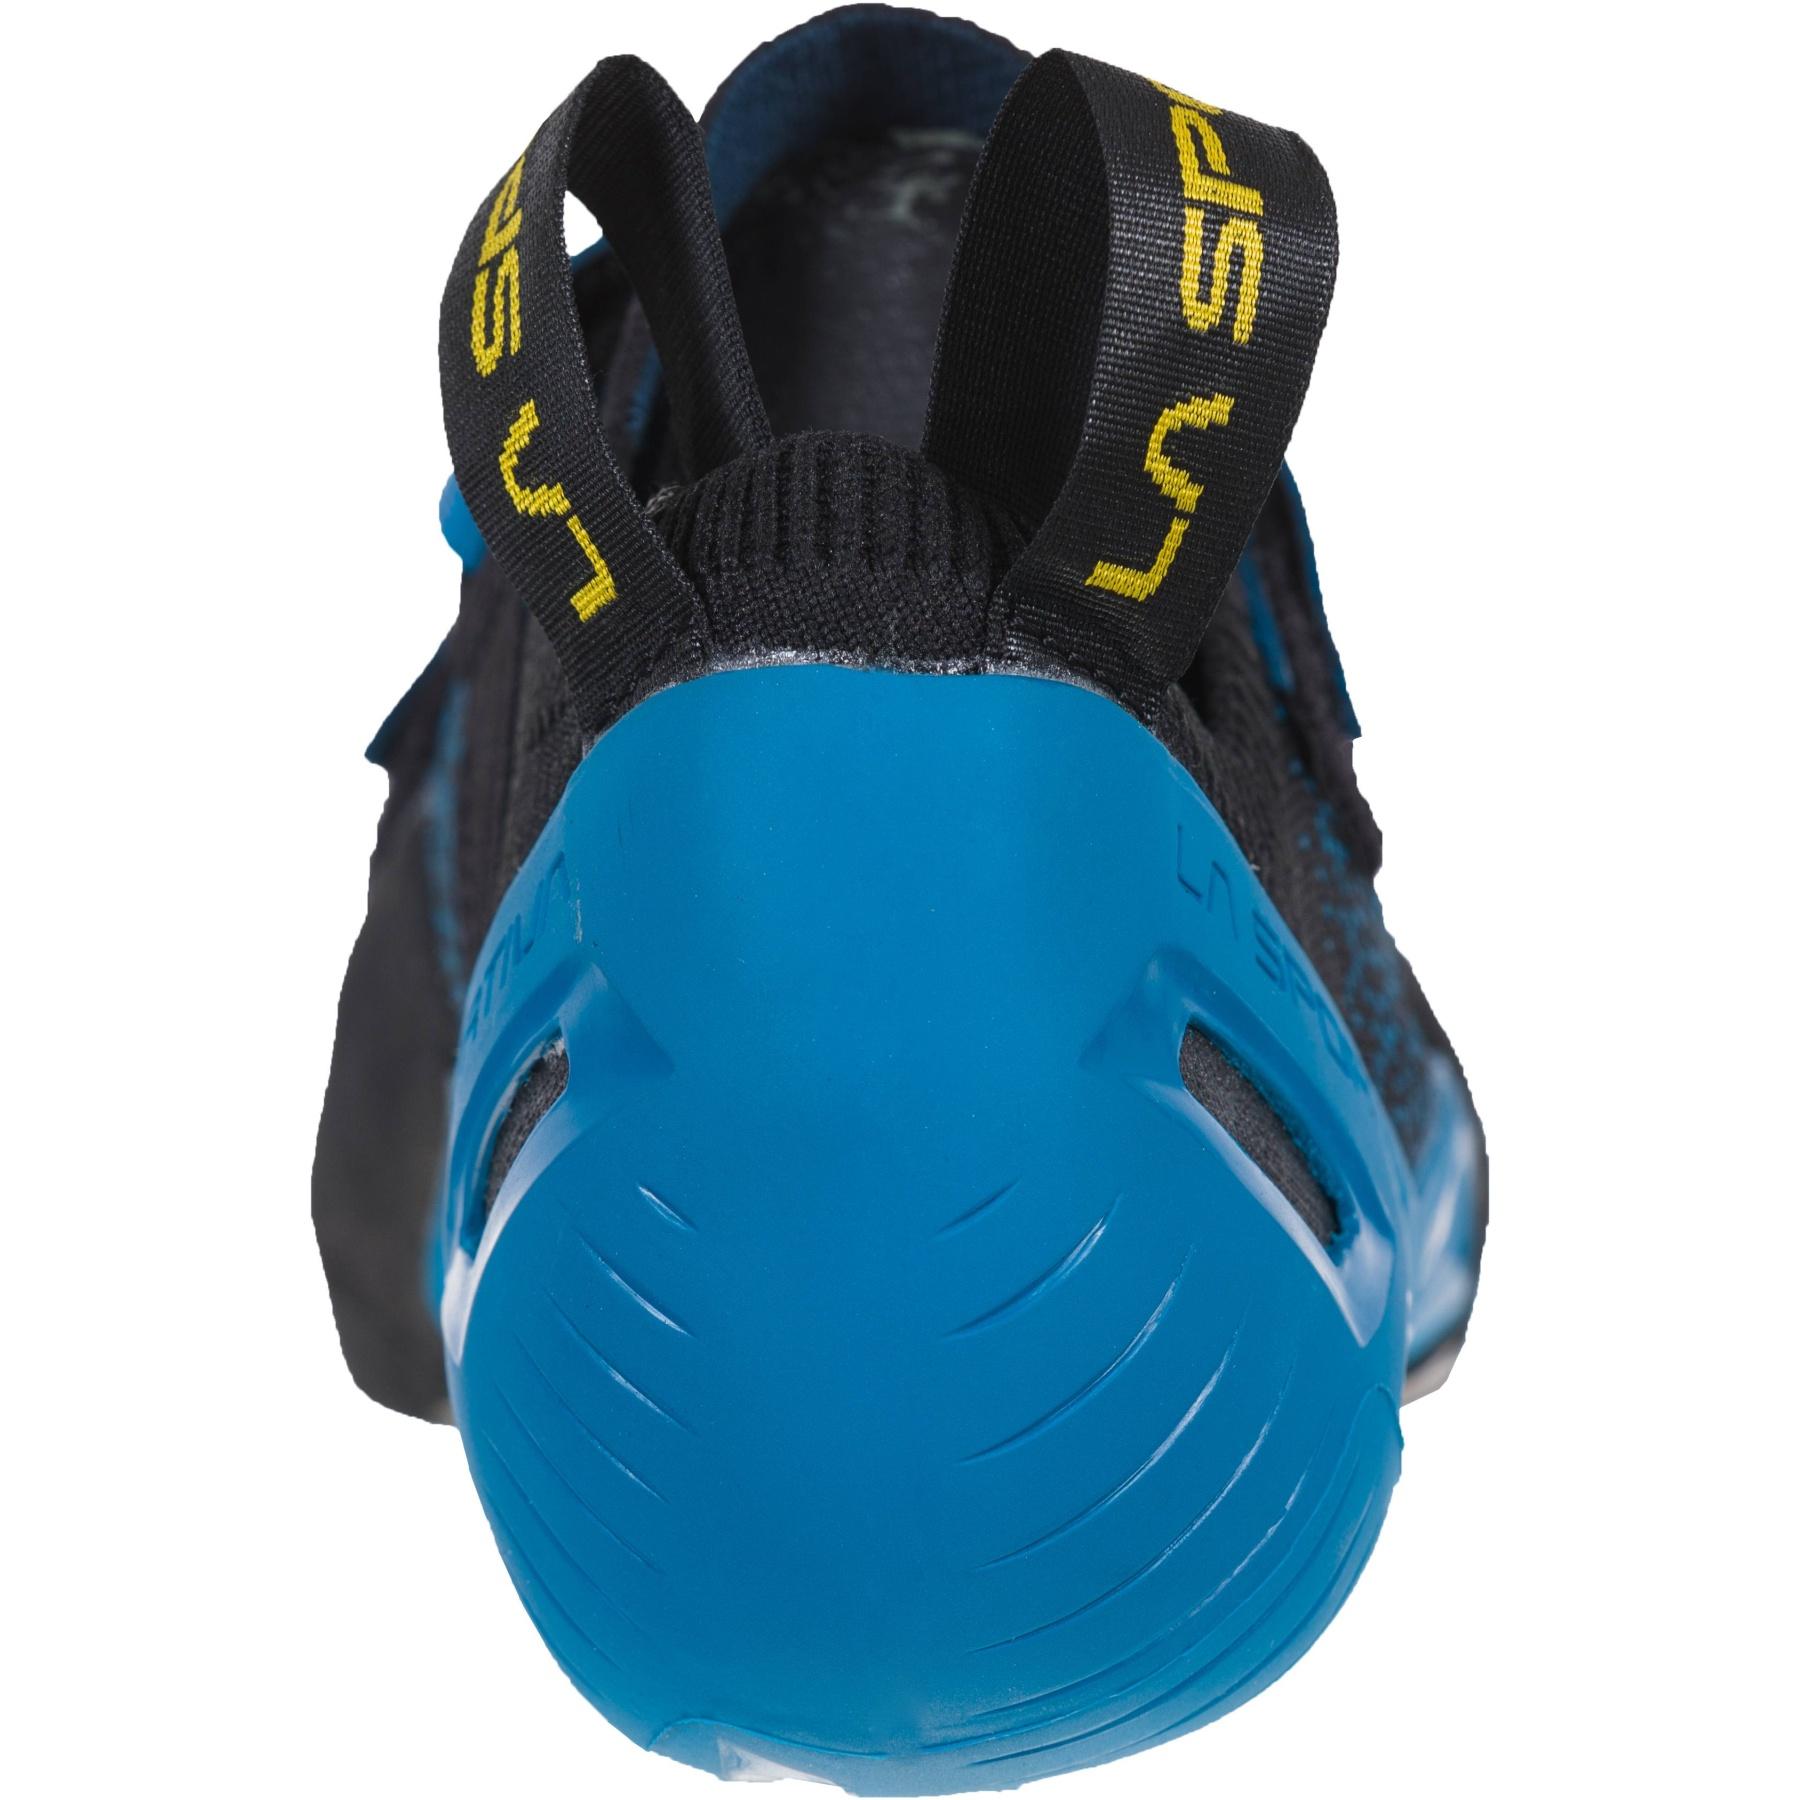 Image of La Sportiva Zenit Climbing Shoes - Neptune/Black